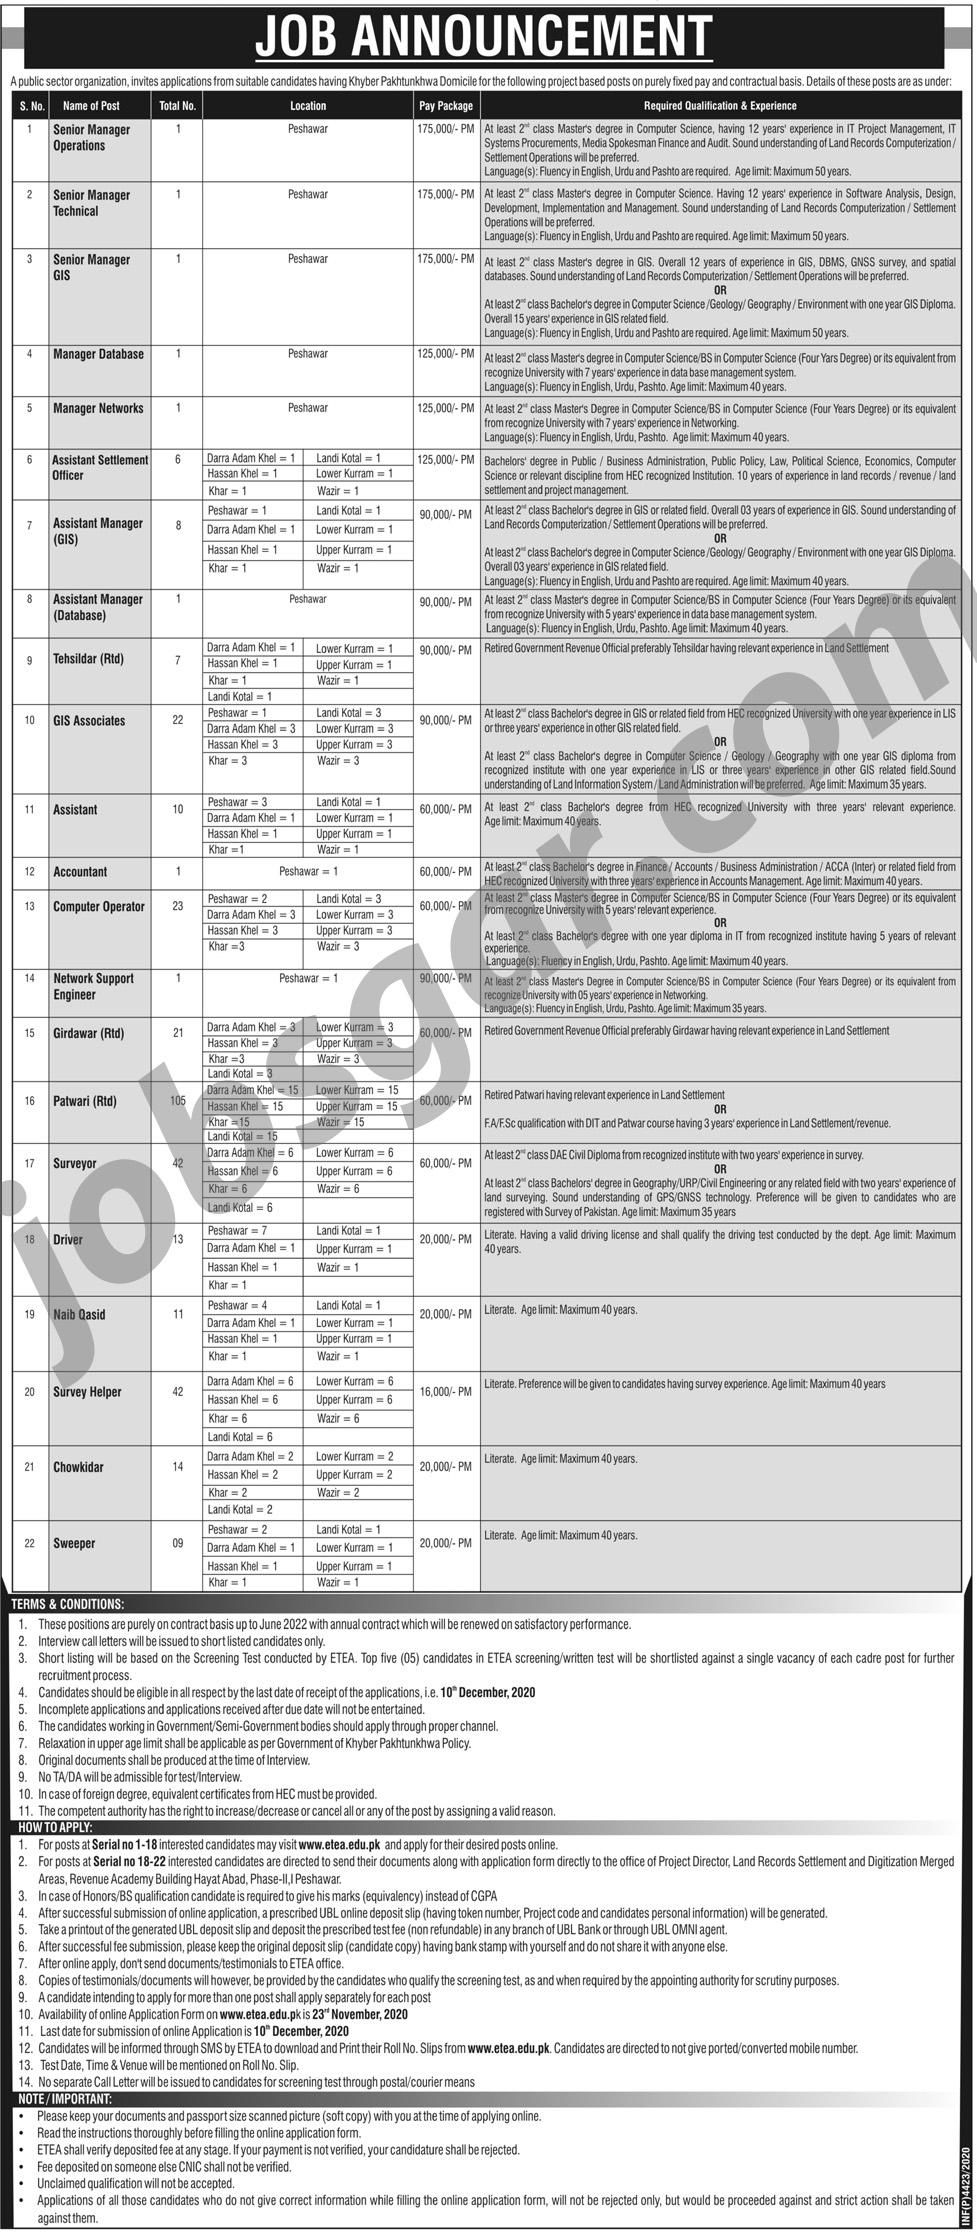 Public Sector Organization Peshawar jobs 2020 via ETEA